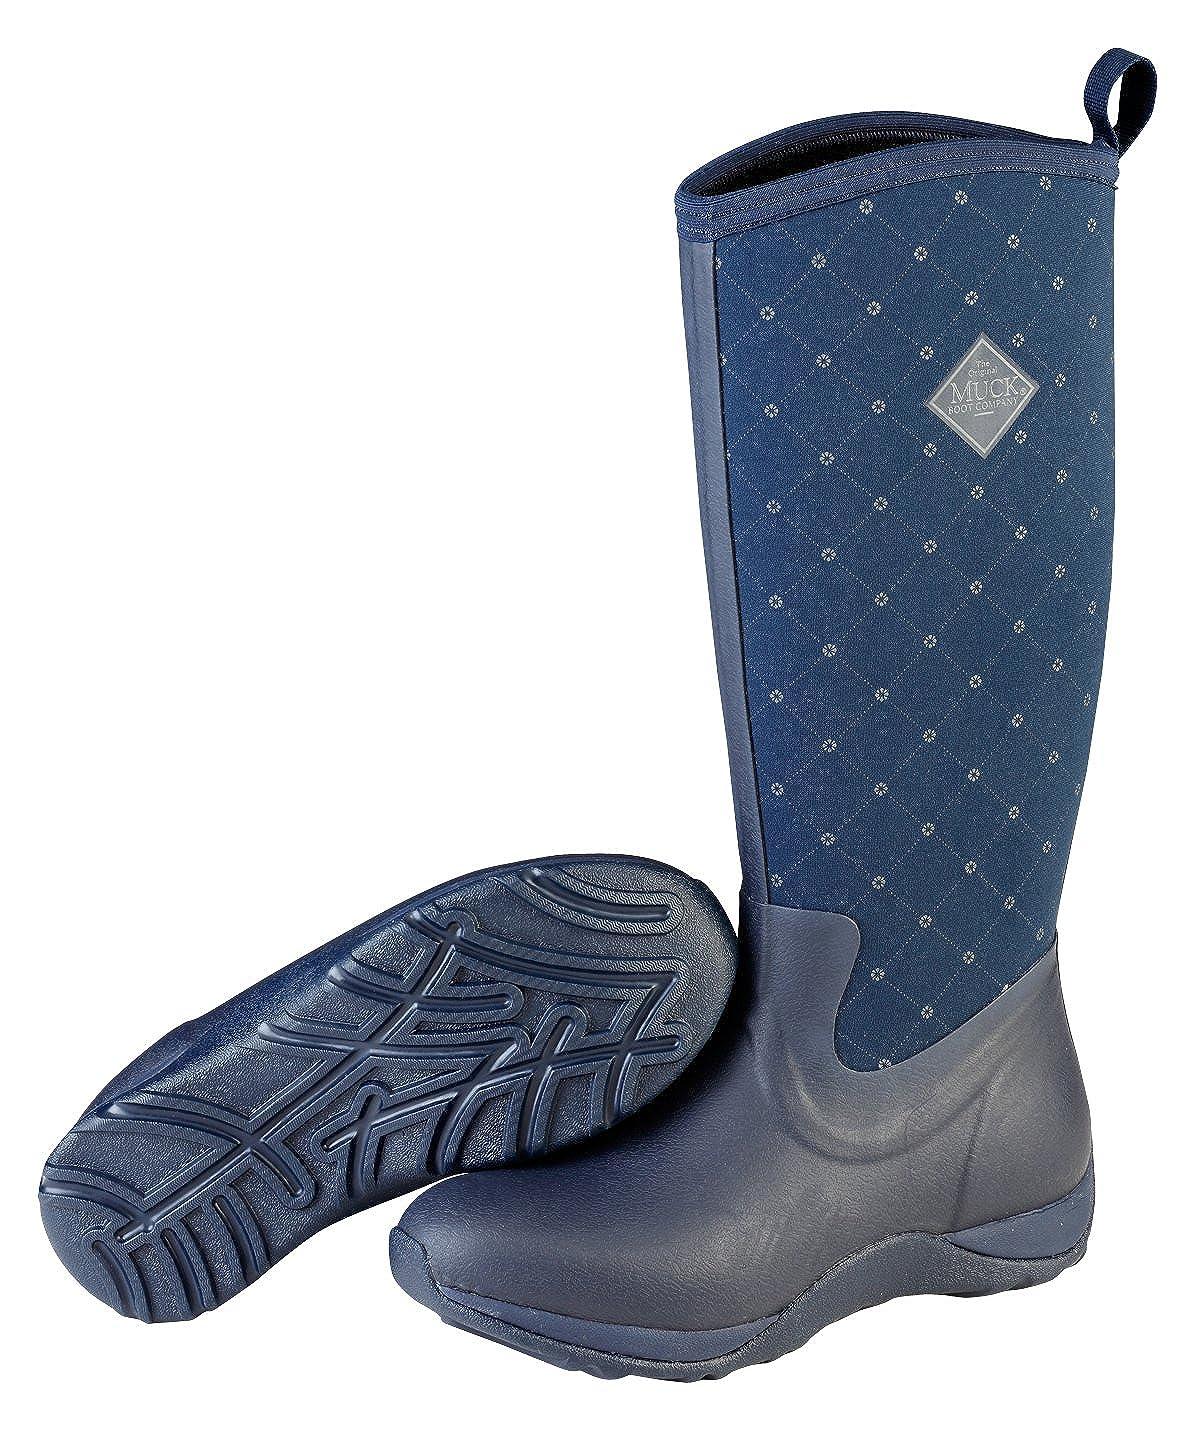 [Muck Boot] レディース Arctic Adventure B01INY88ZI 5 B(M) Adventure US|ネイビー ネイビー US ネイビー 5 B(M) US, GMT:d2d3f40f --- sharoshka.org